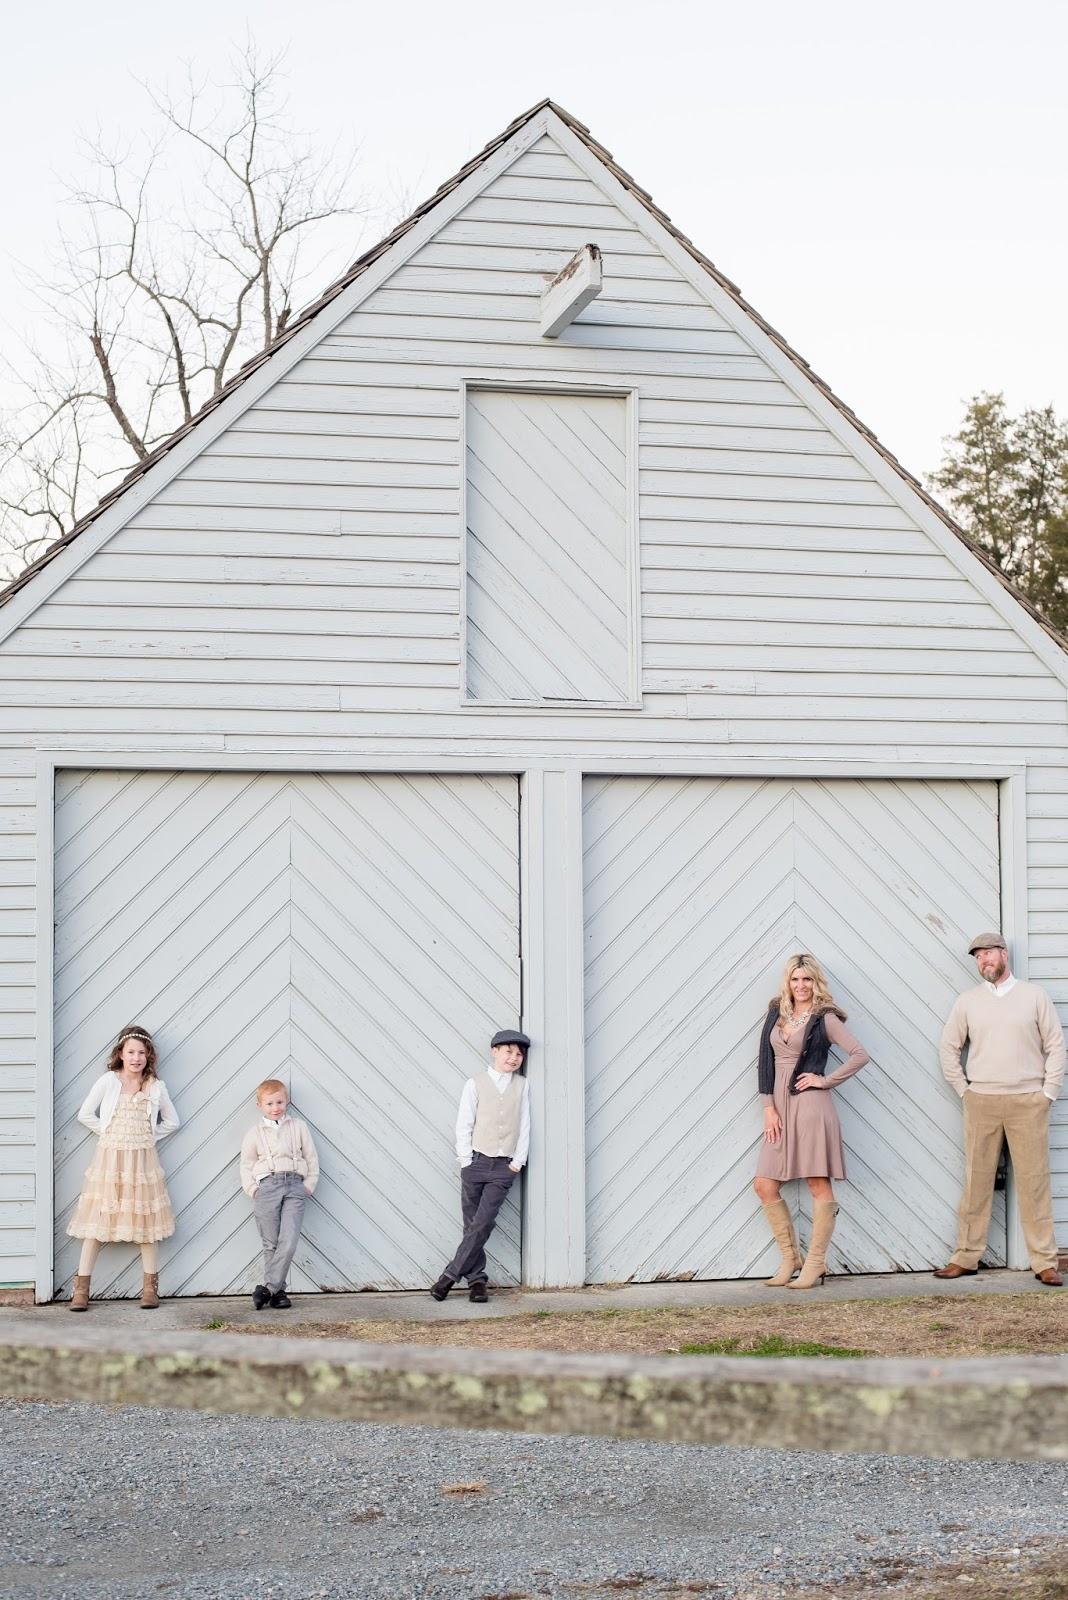 BEST LOCATIONS TO PHOTOGRAPH in RICHMOND, VA | ANIKOLEVAIPHOTOGRAPHY.COM